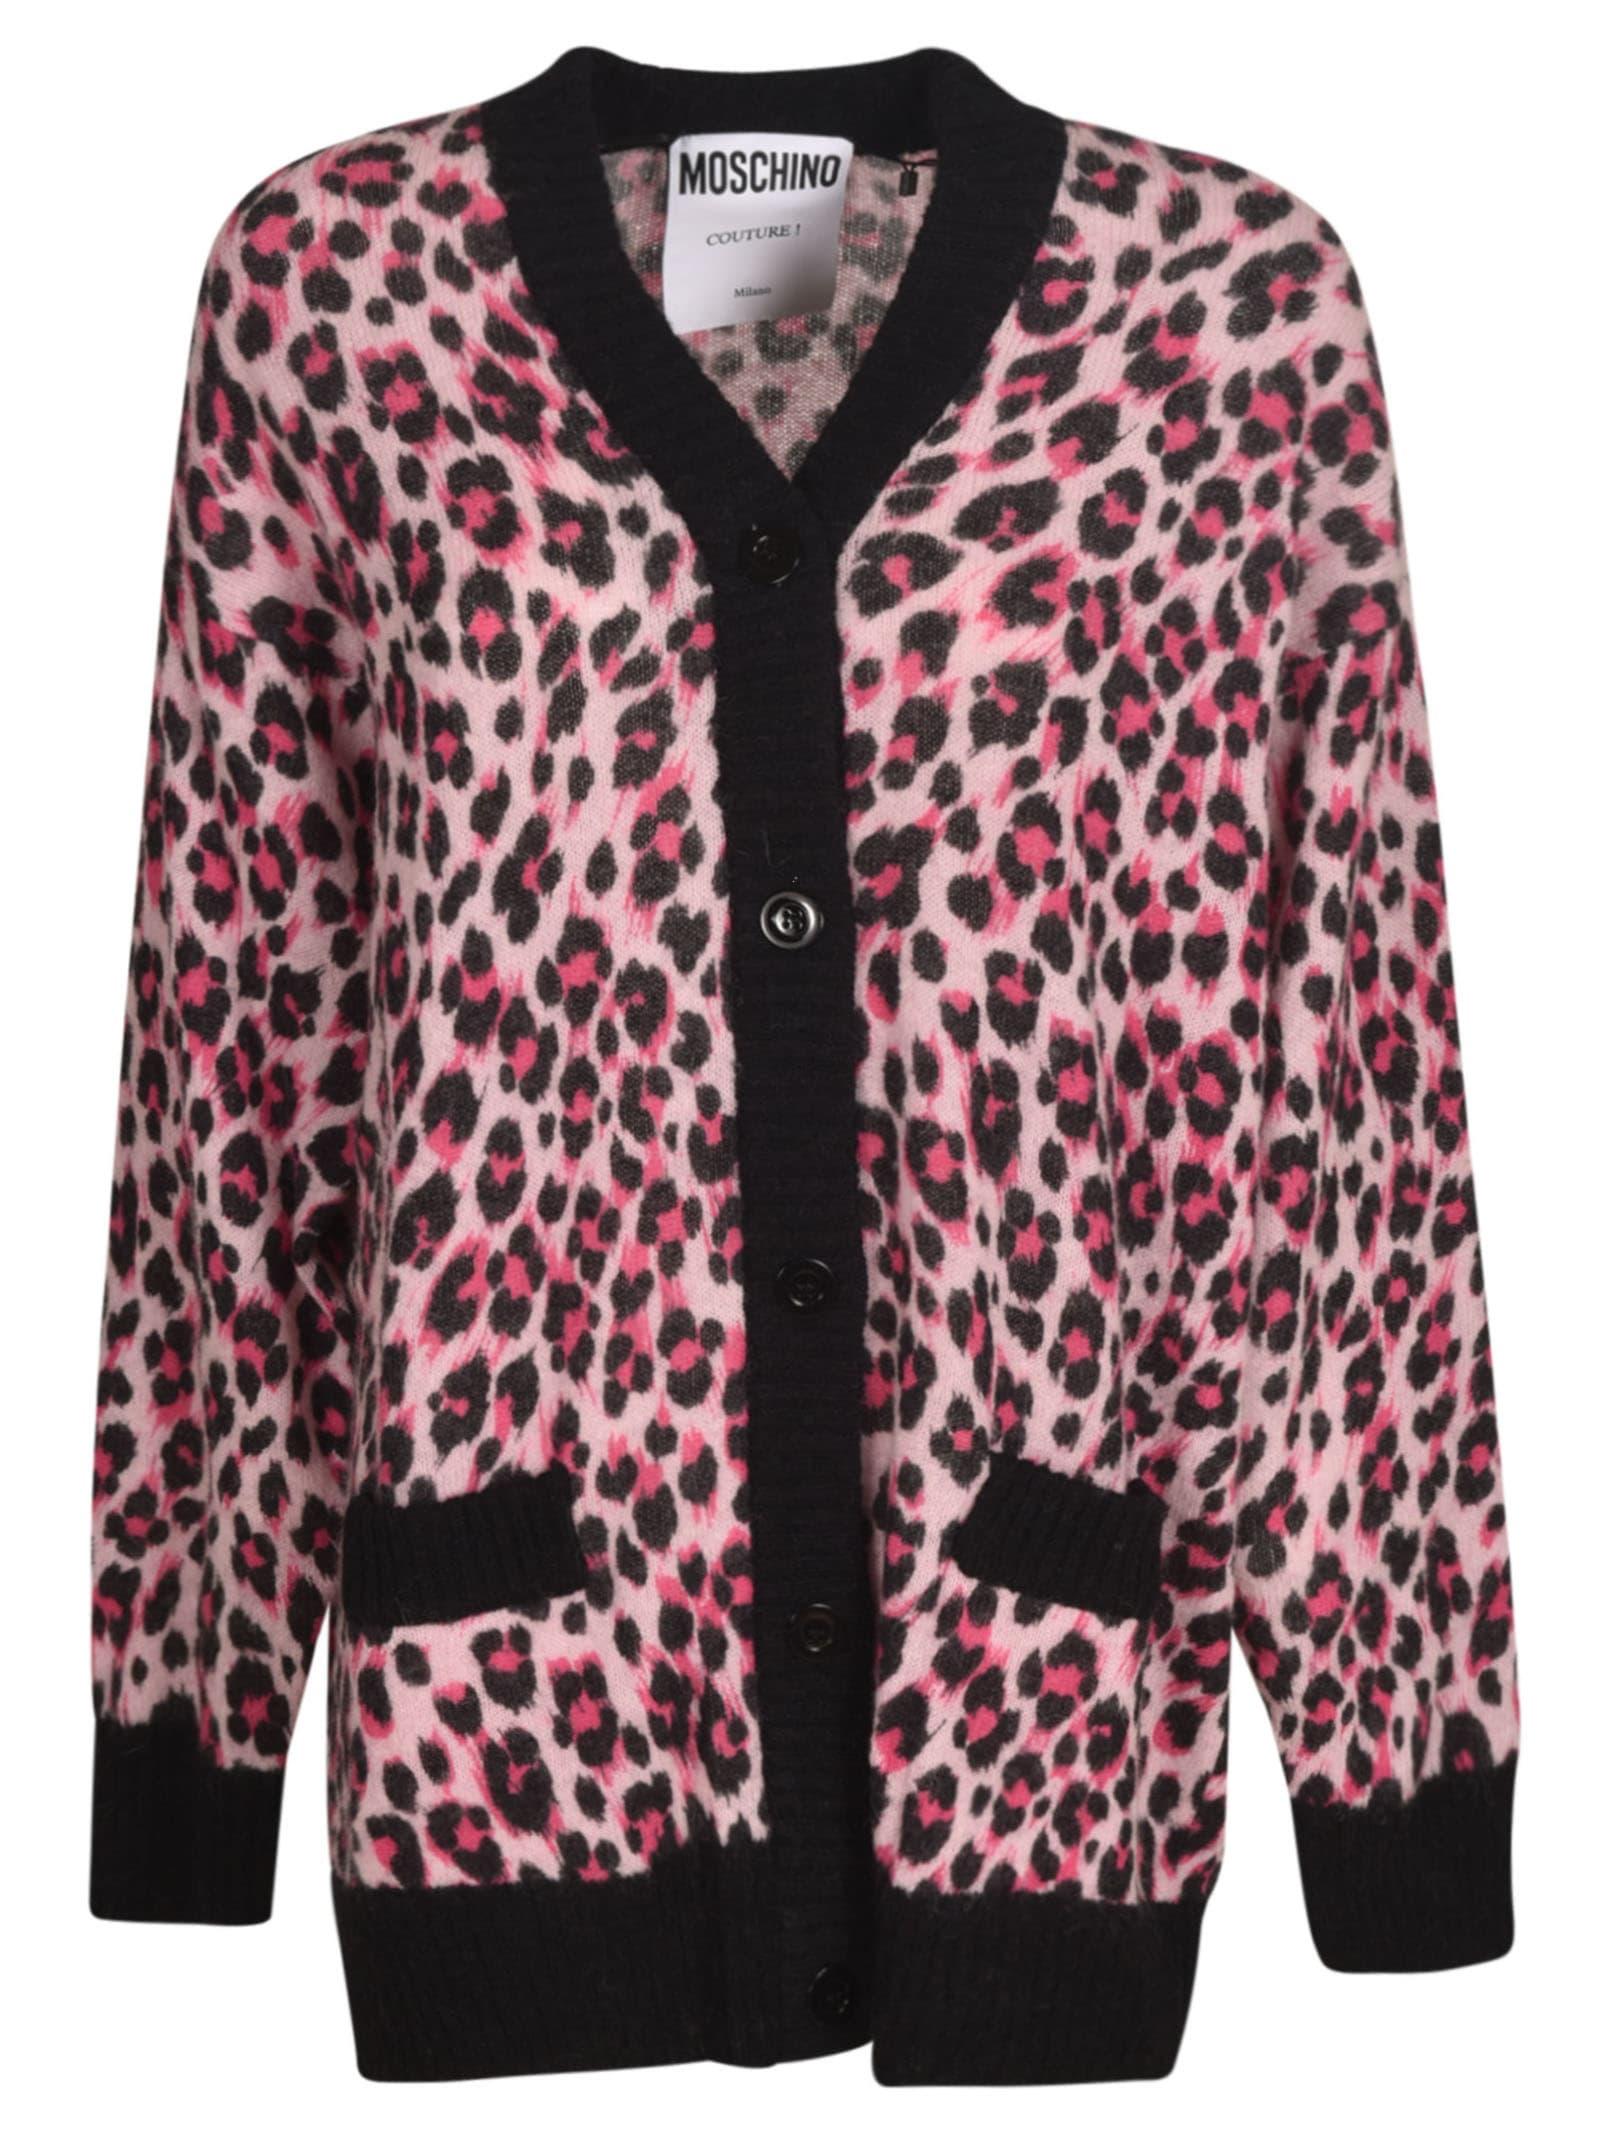 Moschino Leopard Cardigan In Fuchsia/black